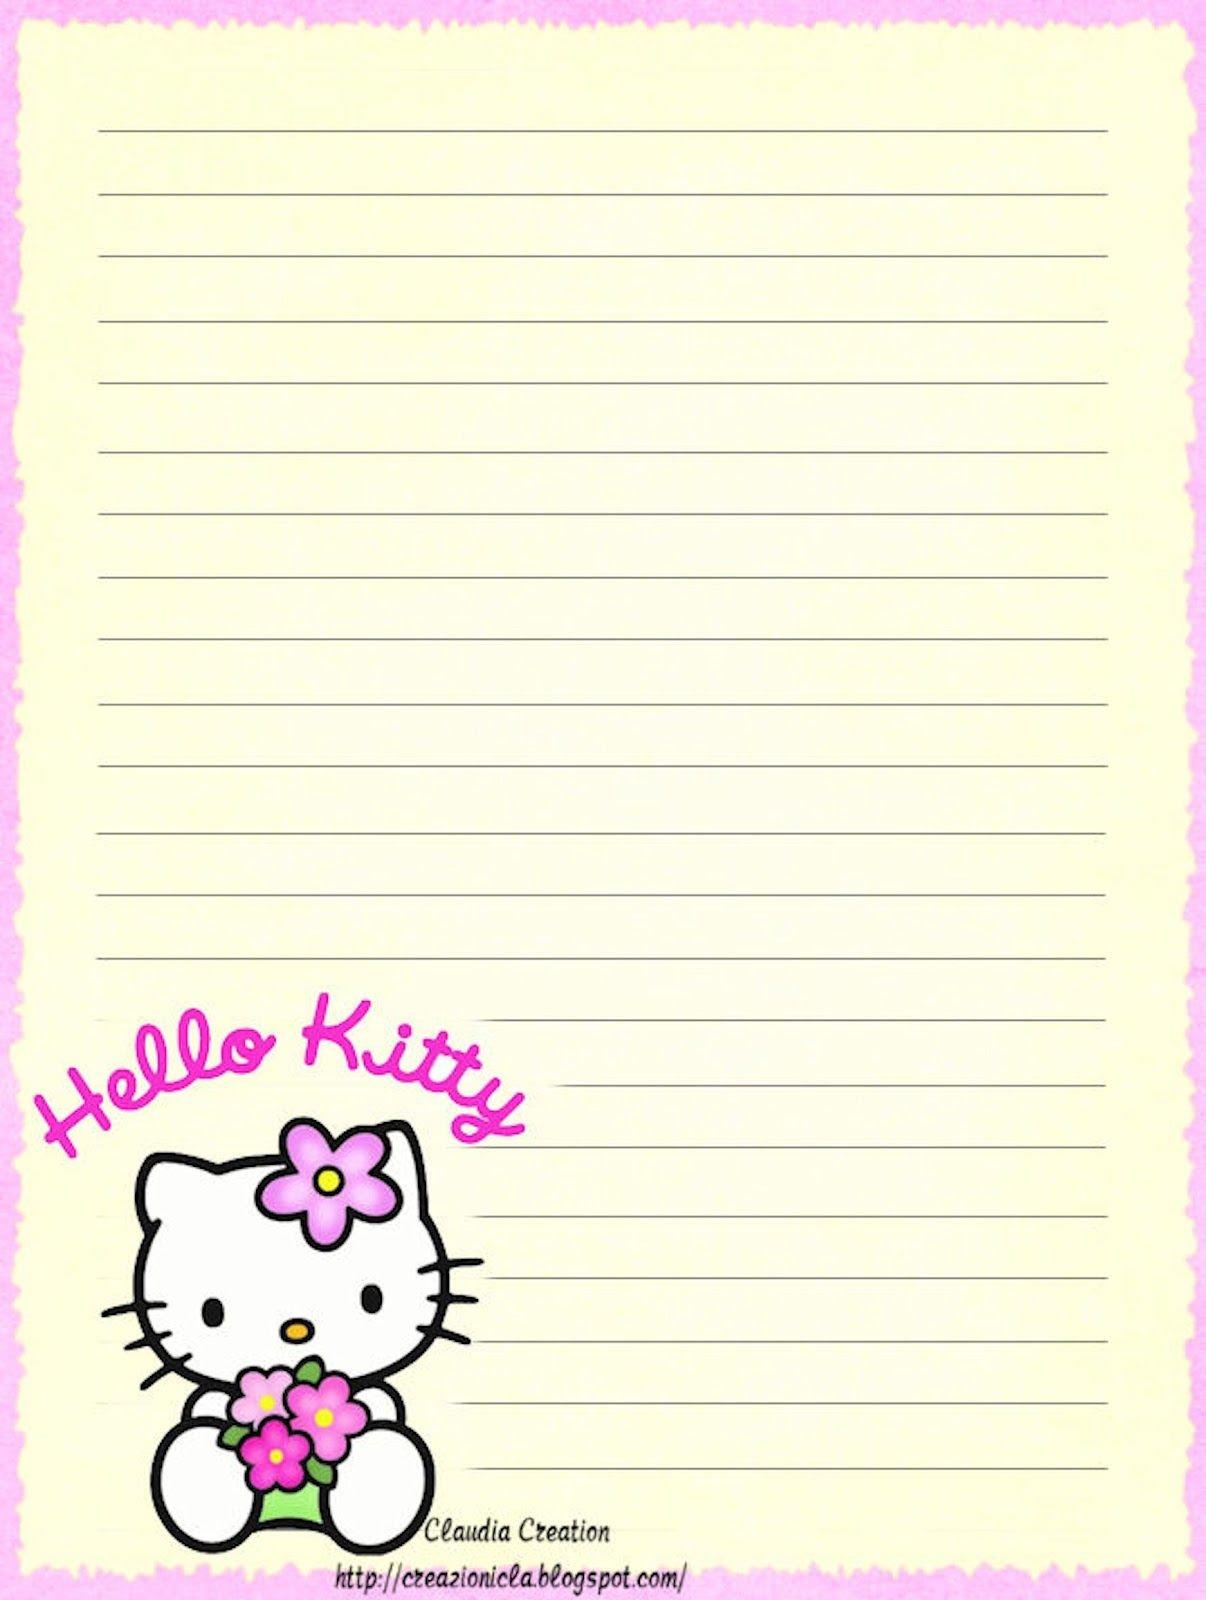 Hello Kitty | Borders,stationary,backgrounds | Hello Kitty, Hello - Free Printable Hello Kitty Stationery